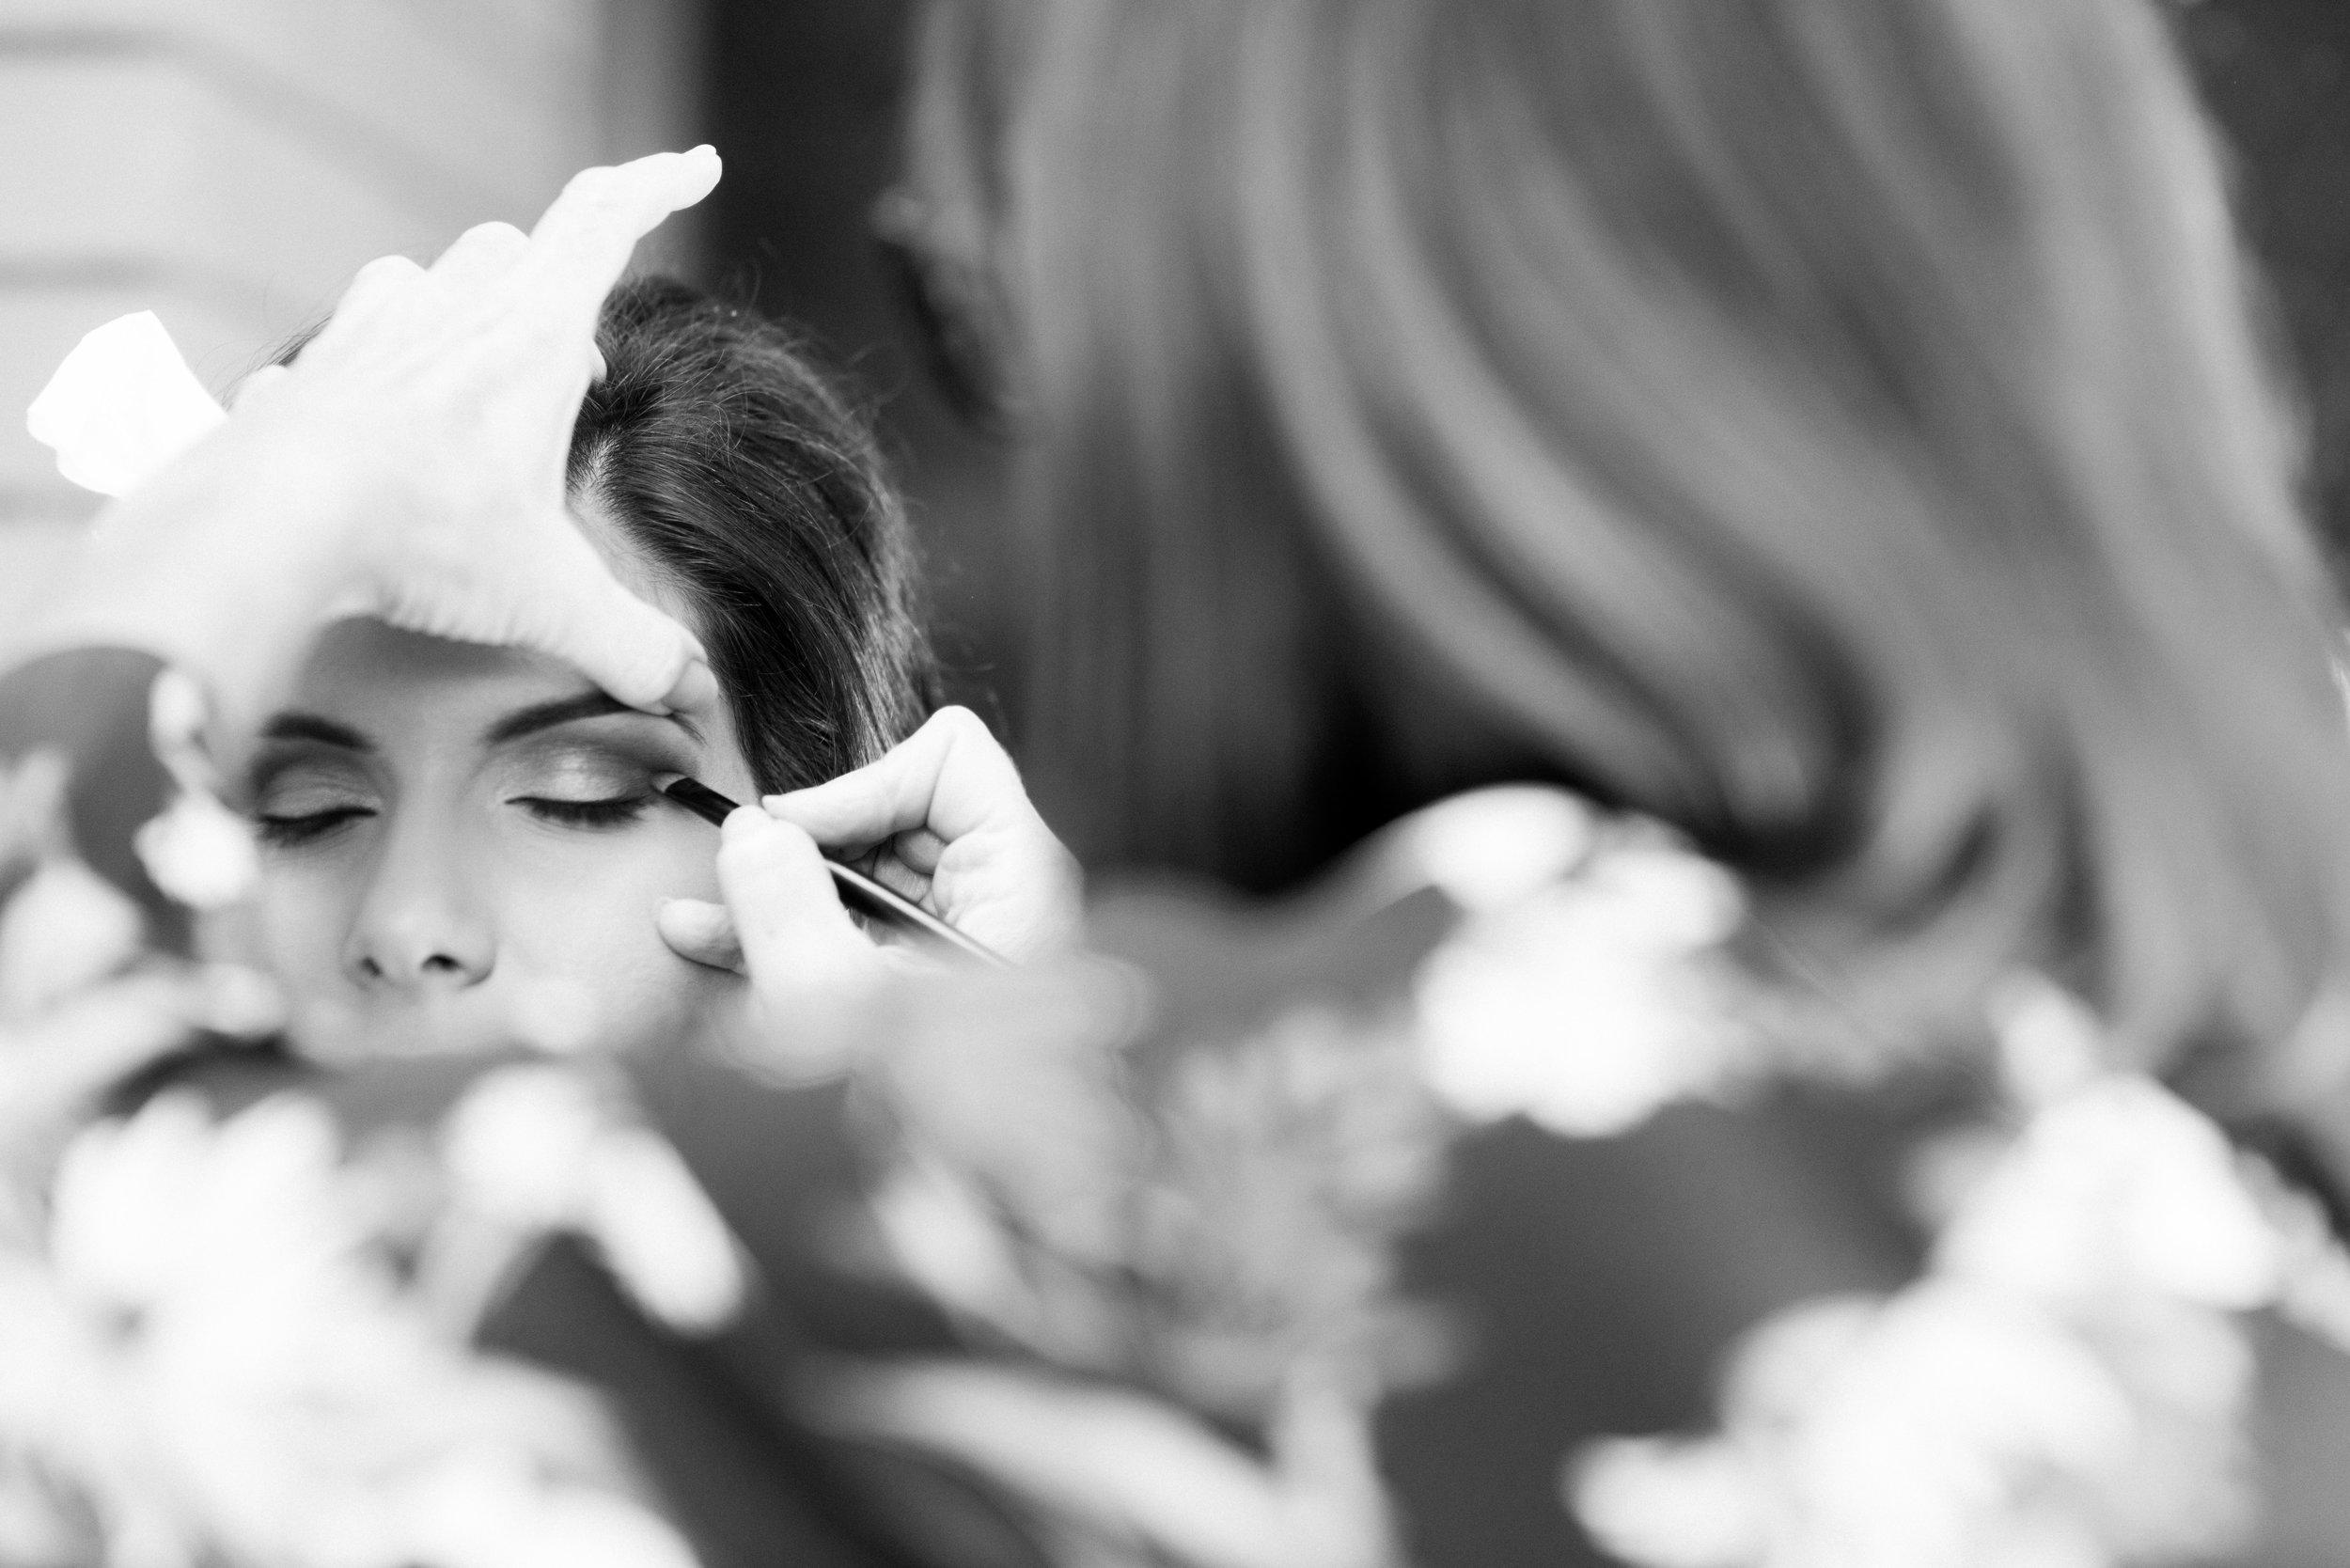 brisbane-city-wedding-photography-the-loft-1-4.jpg